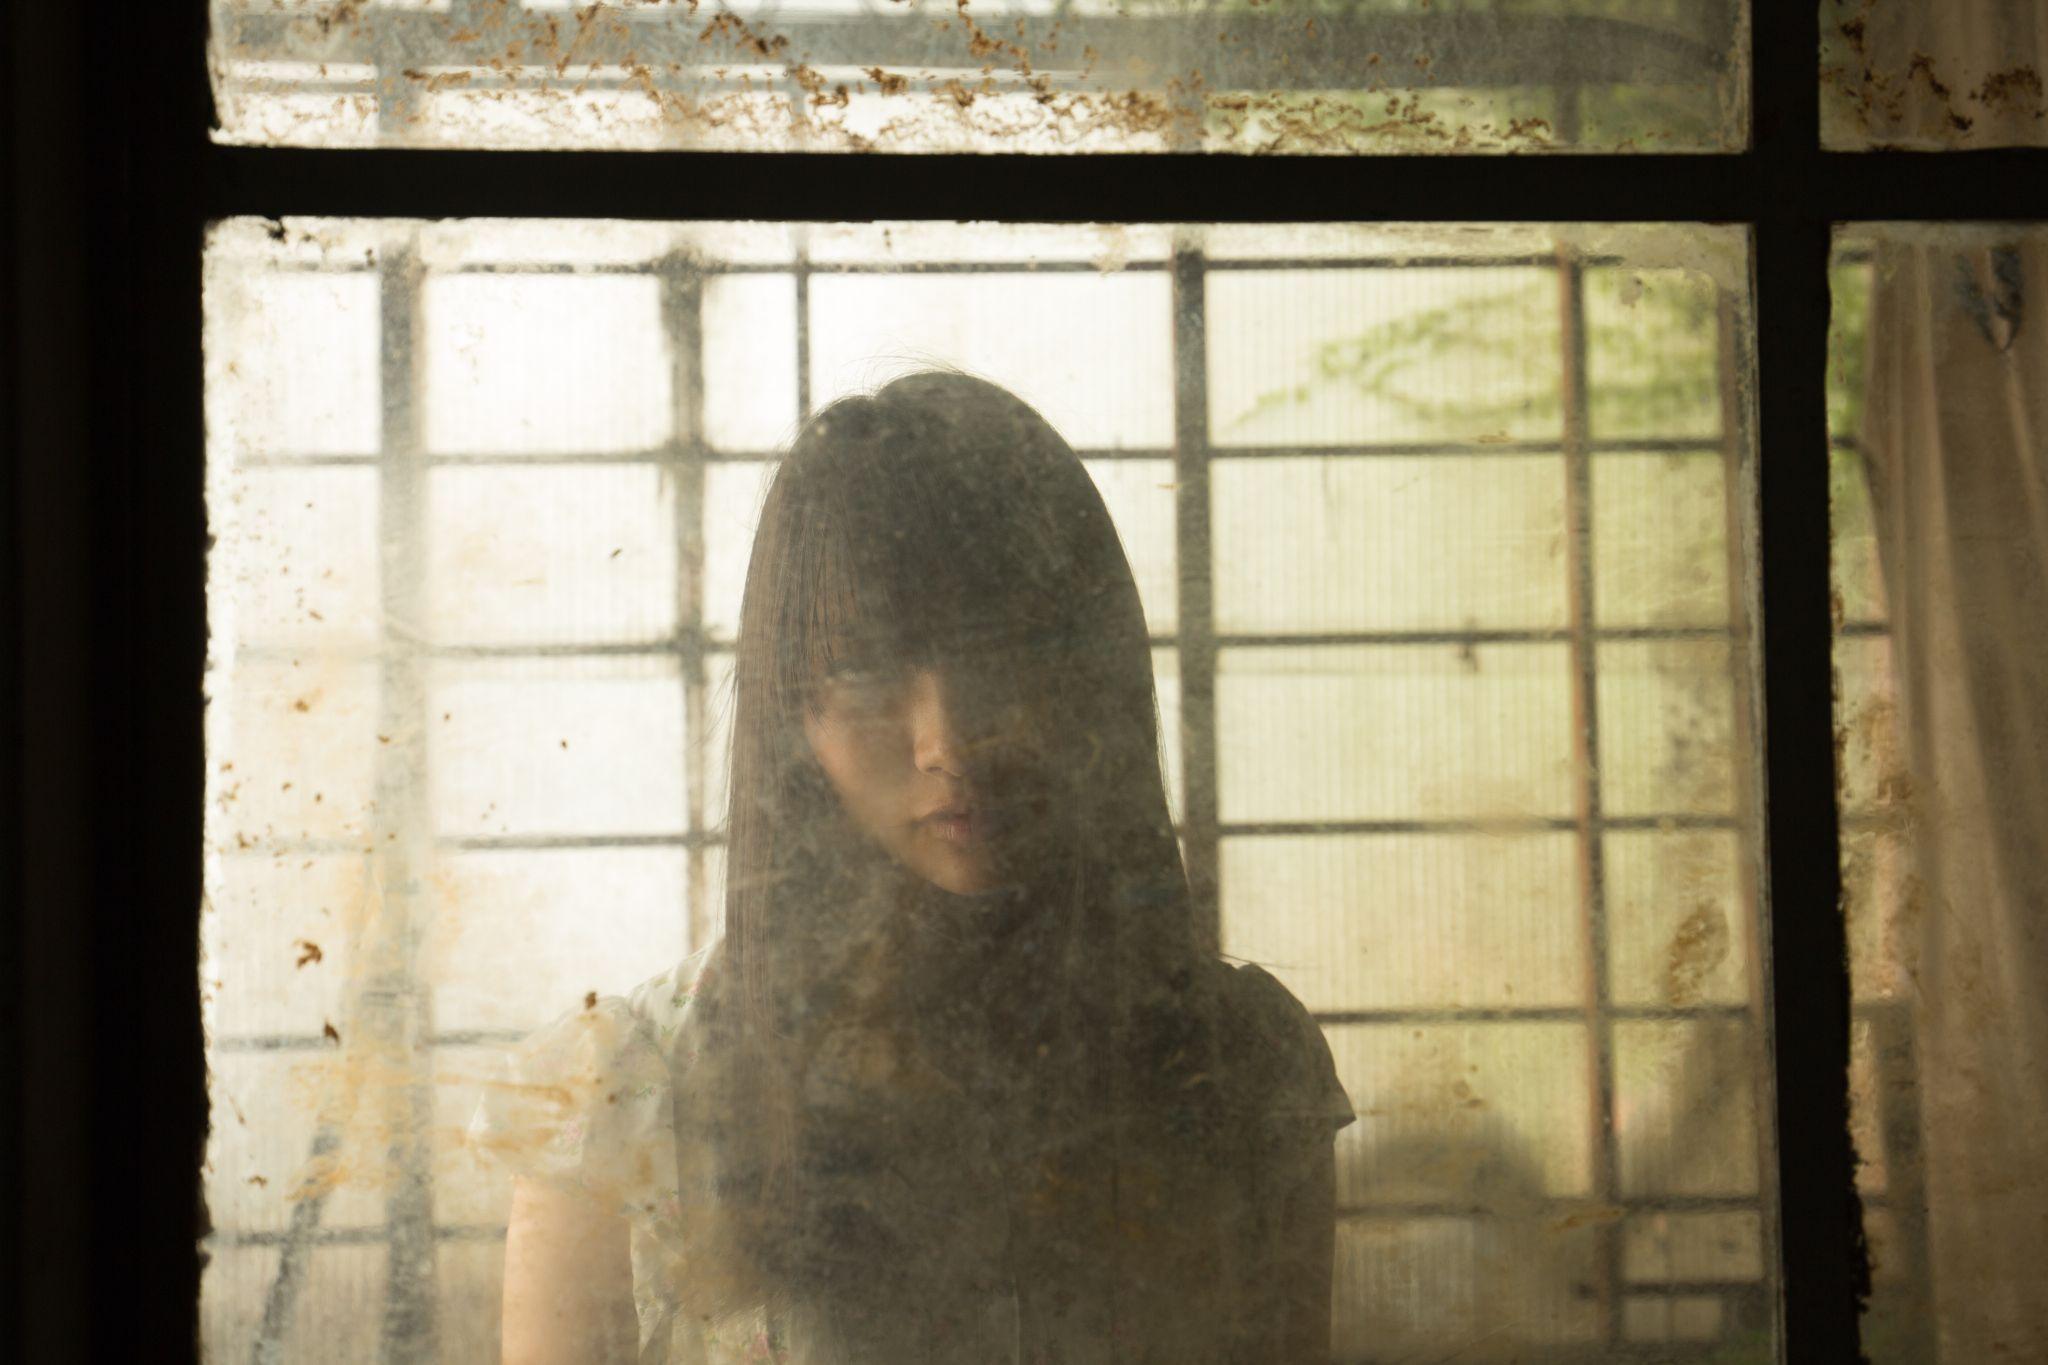 Another possible portrait 2 by tokifumi hayamizu